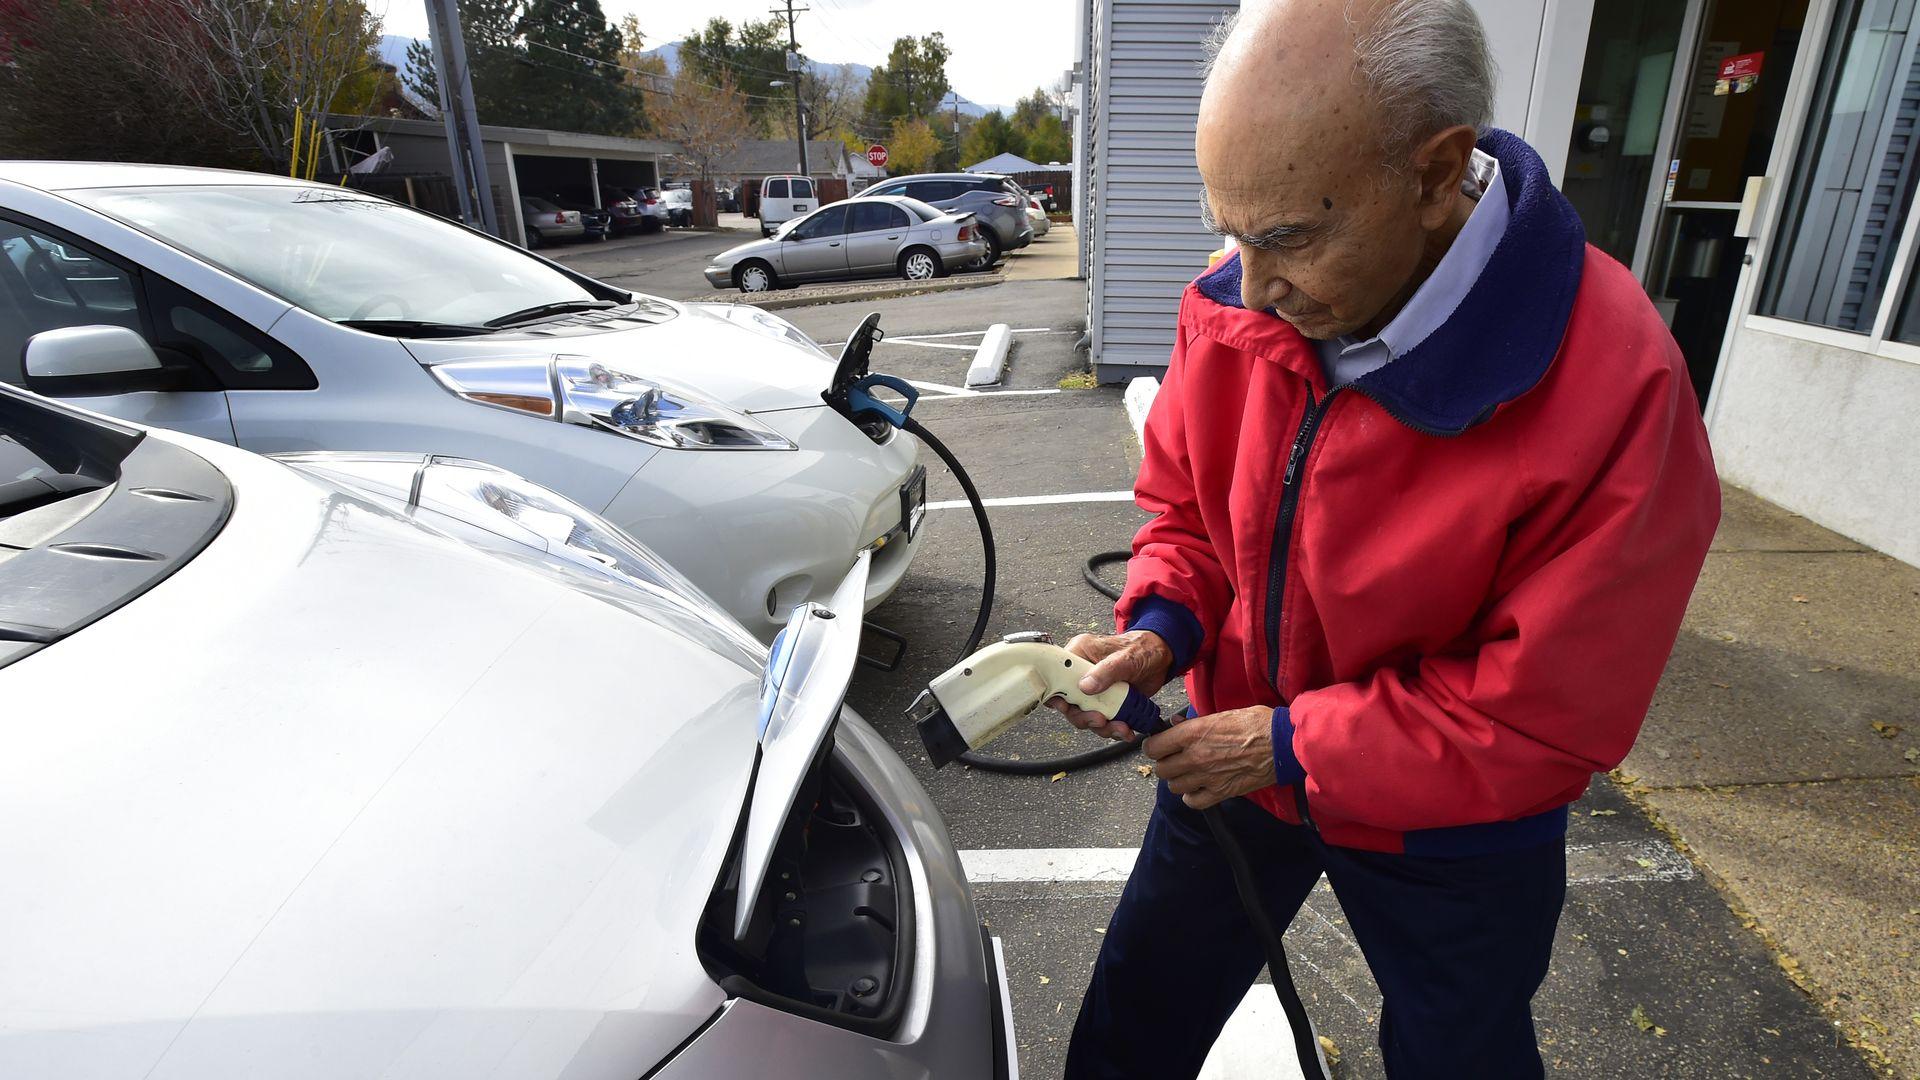 Man charging an electric car in public